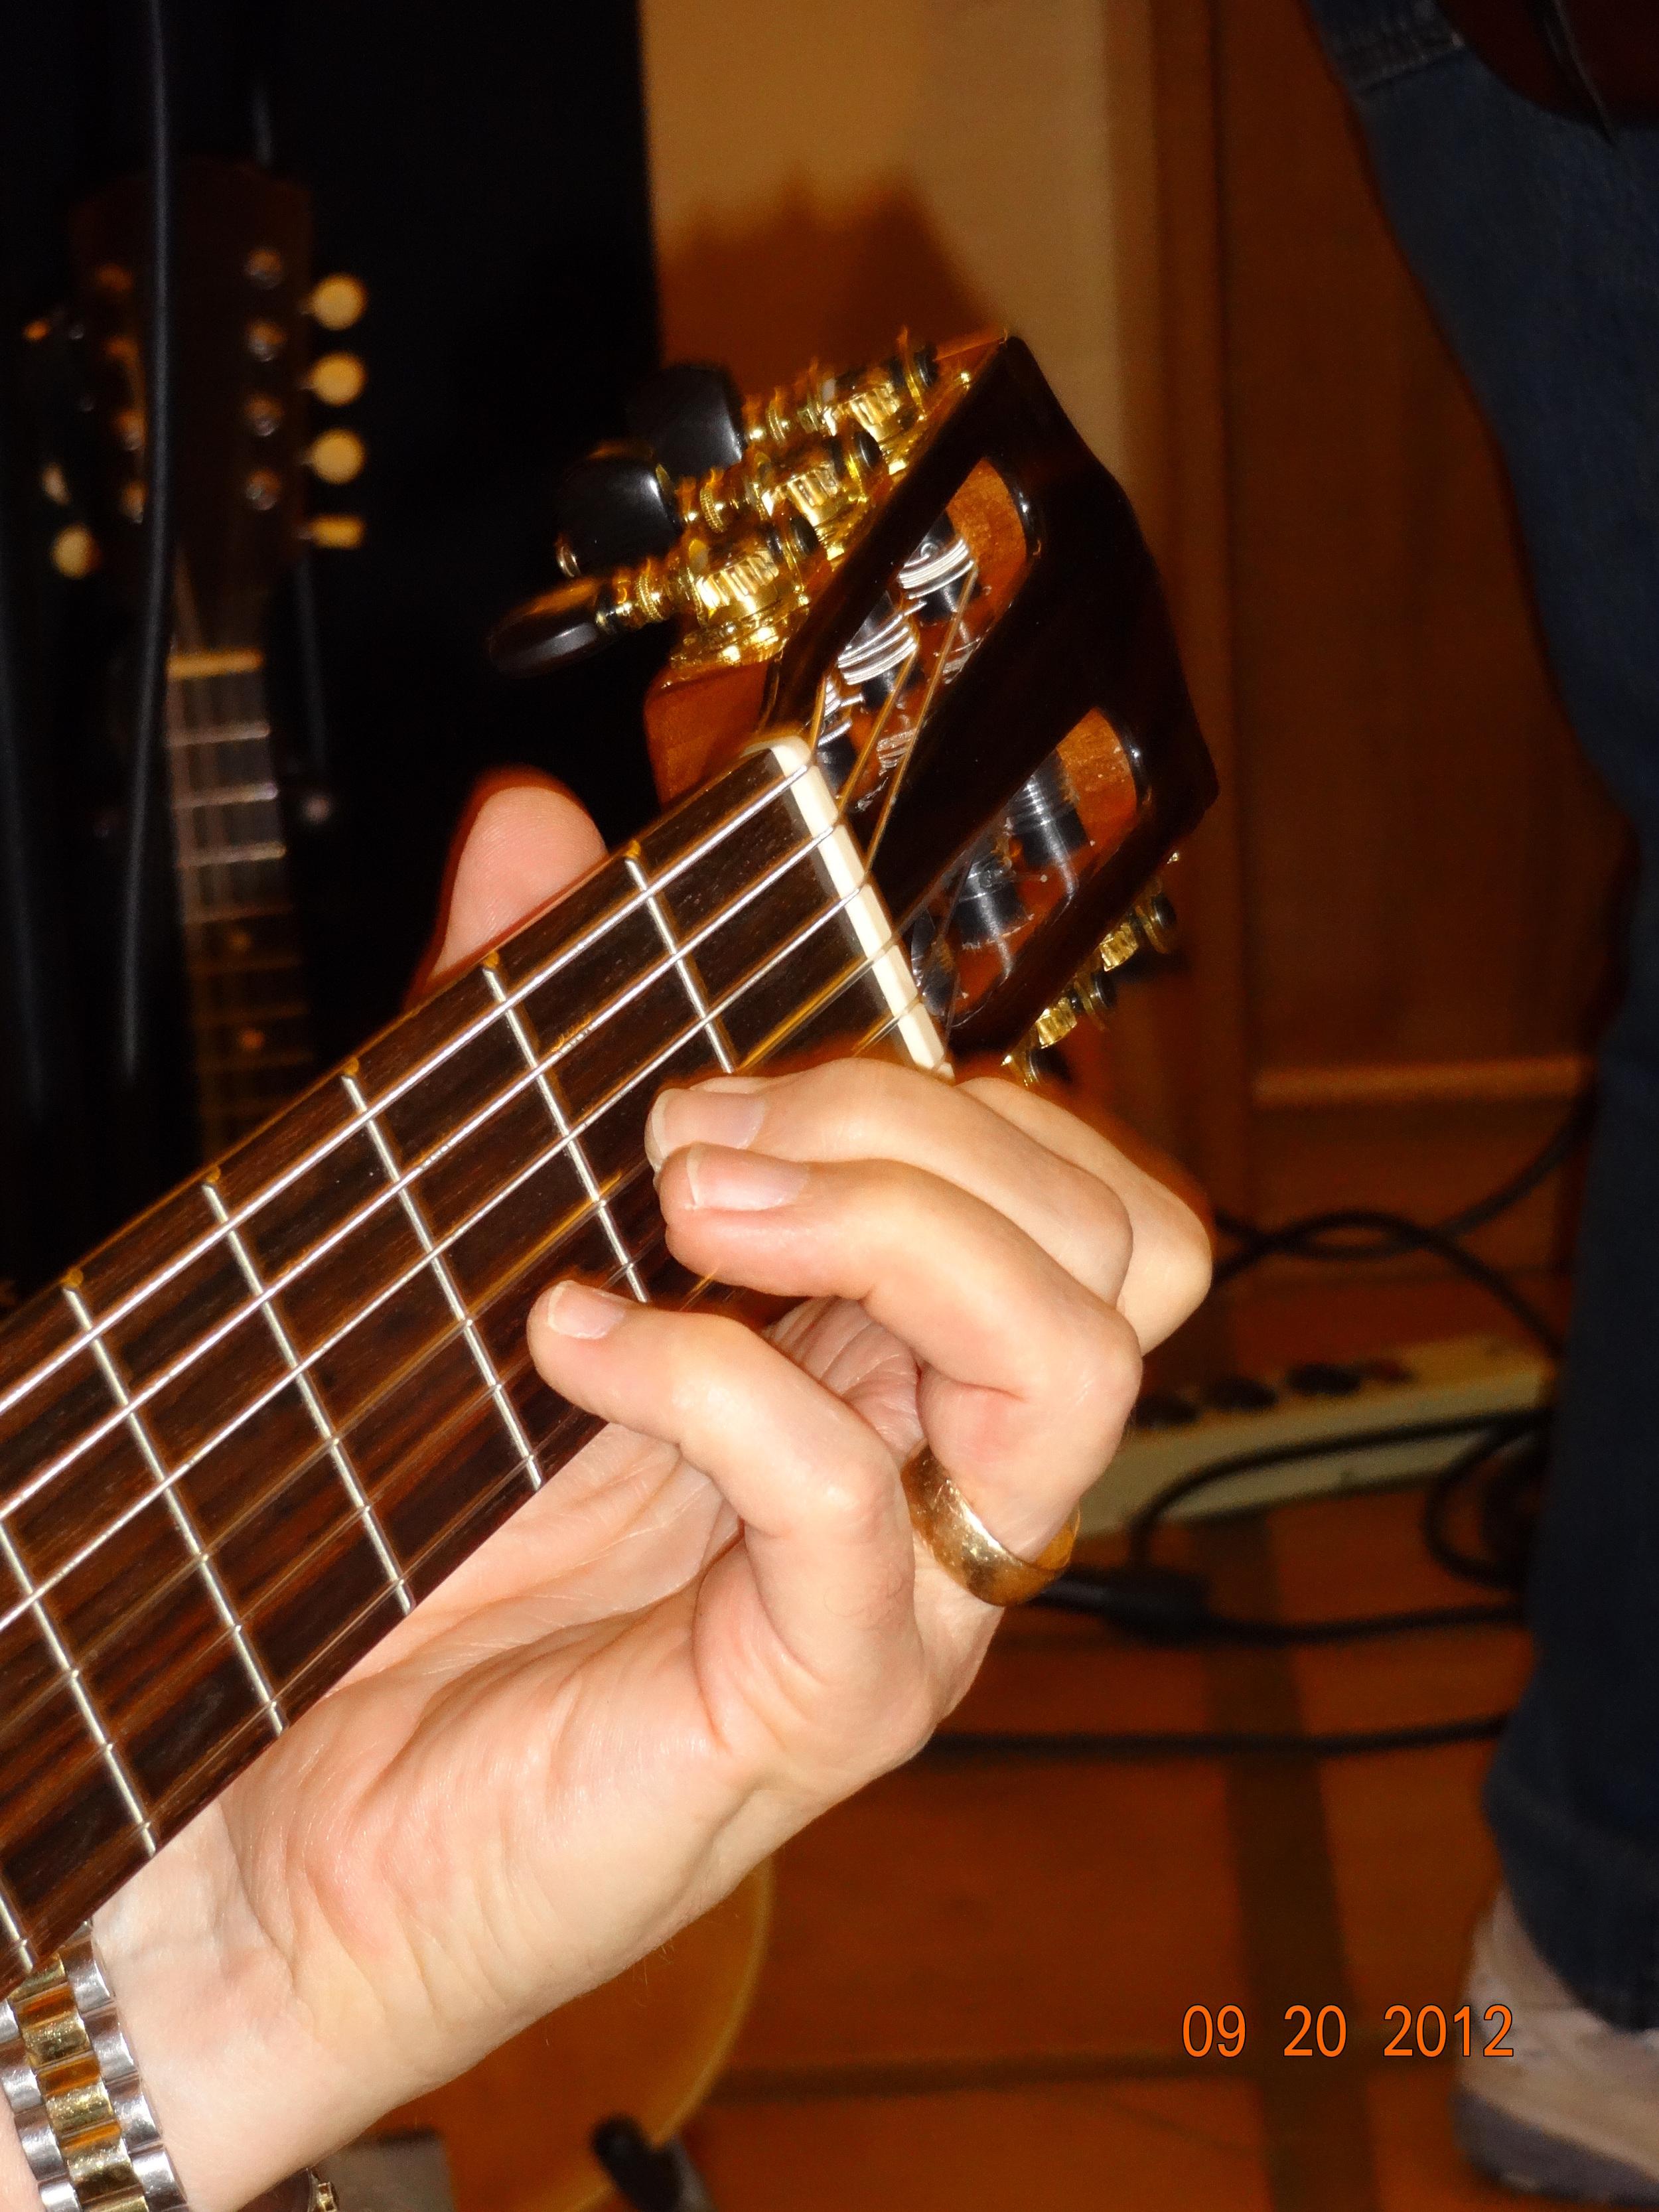 Tom Dukes plays a Cordoba GK Studio Guitar